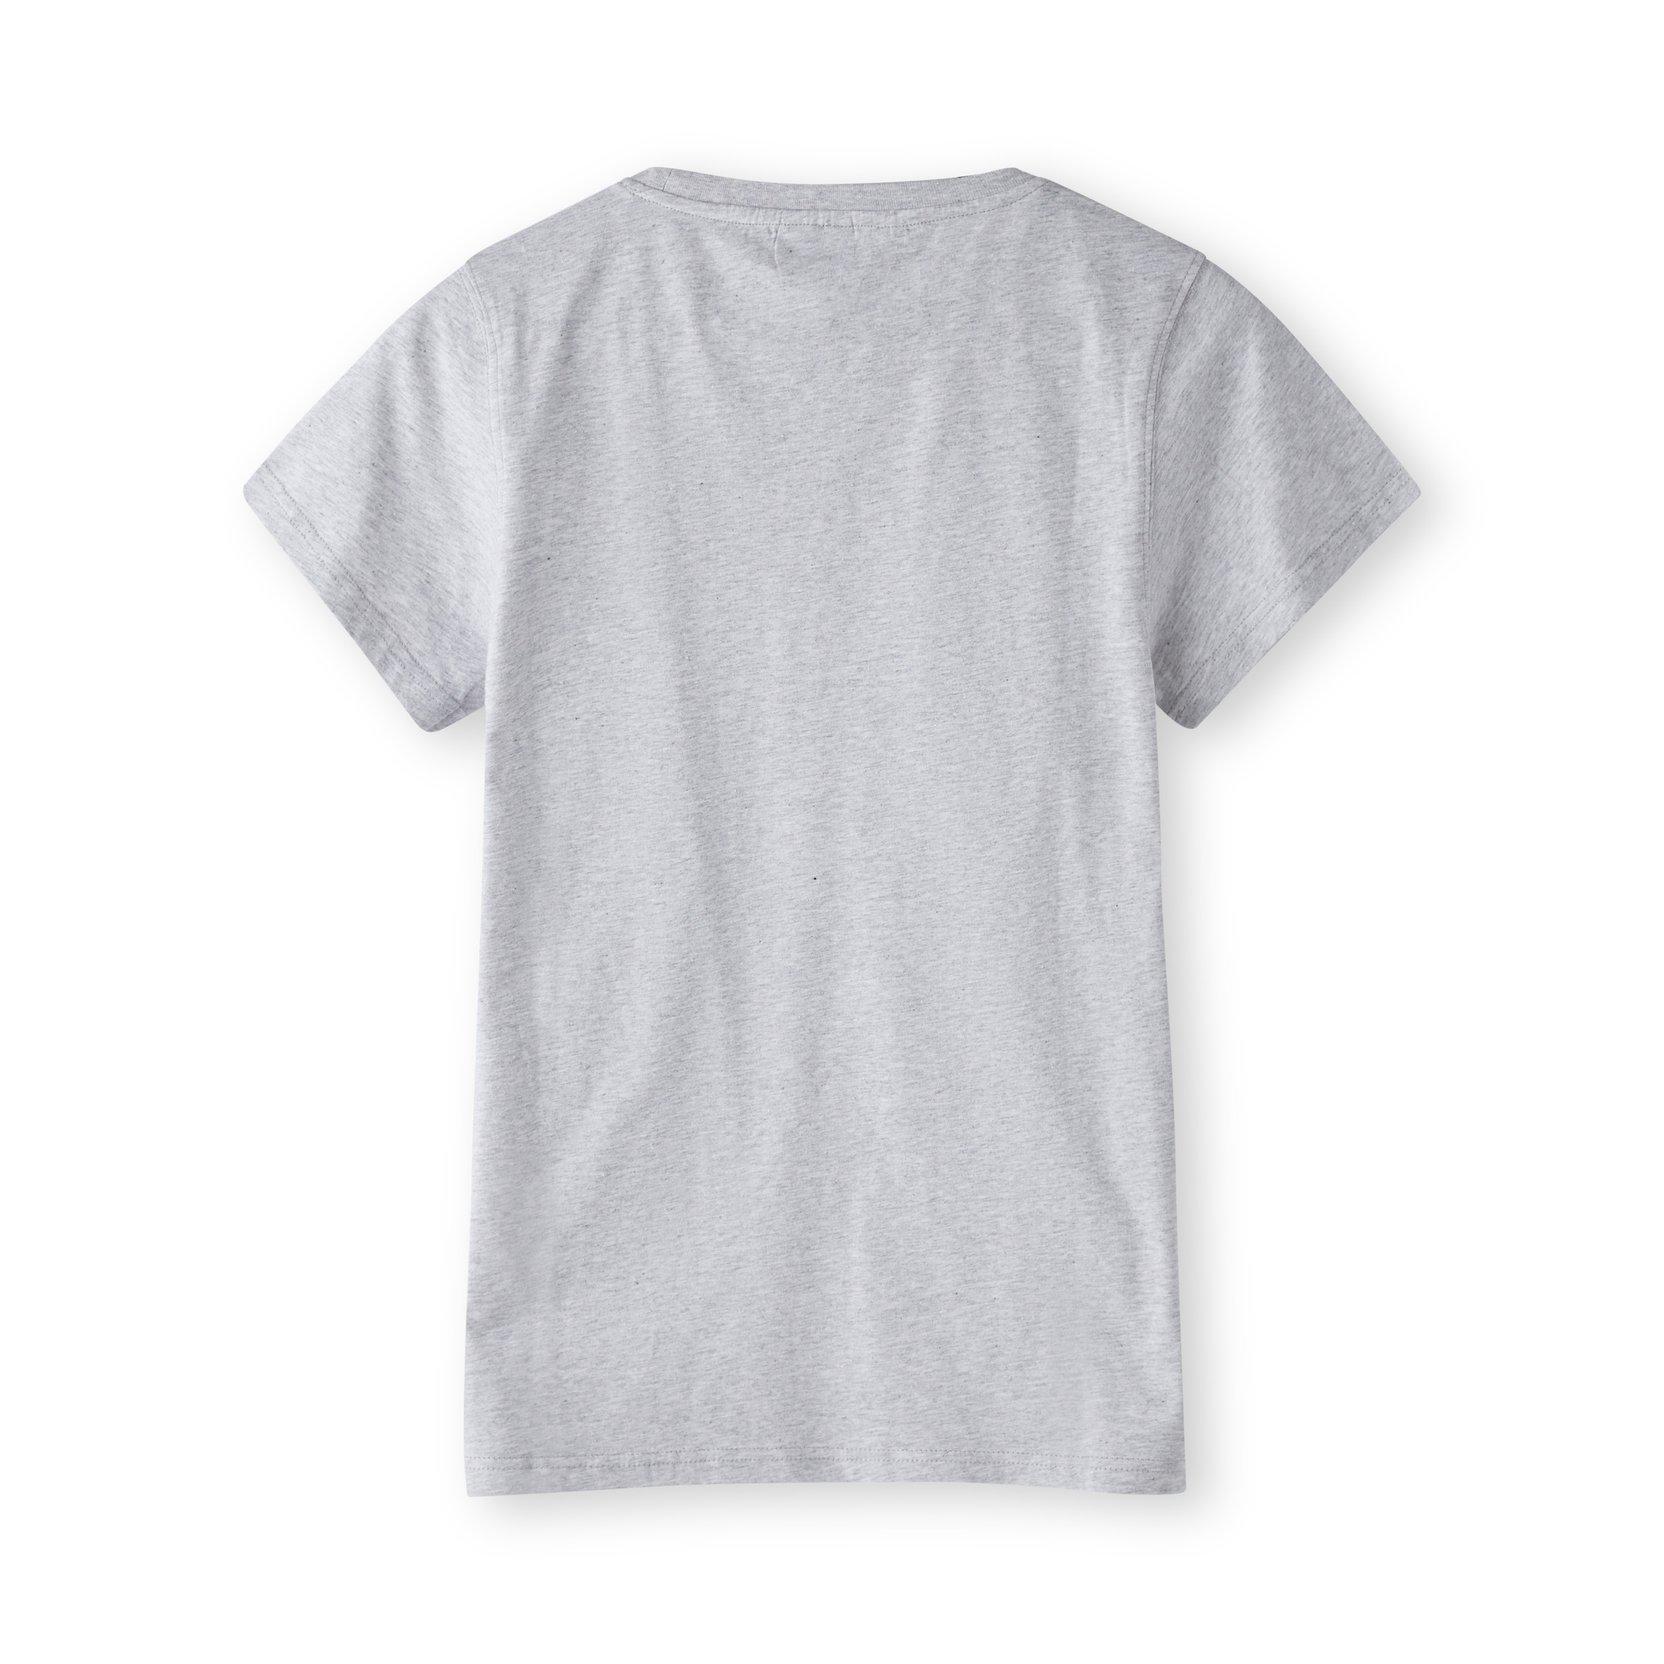 H2O Birkholm t-shirt, light grey melange, small